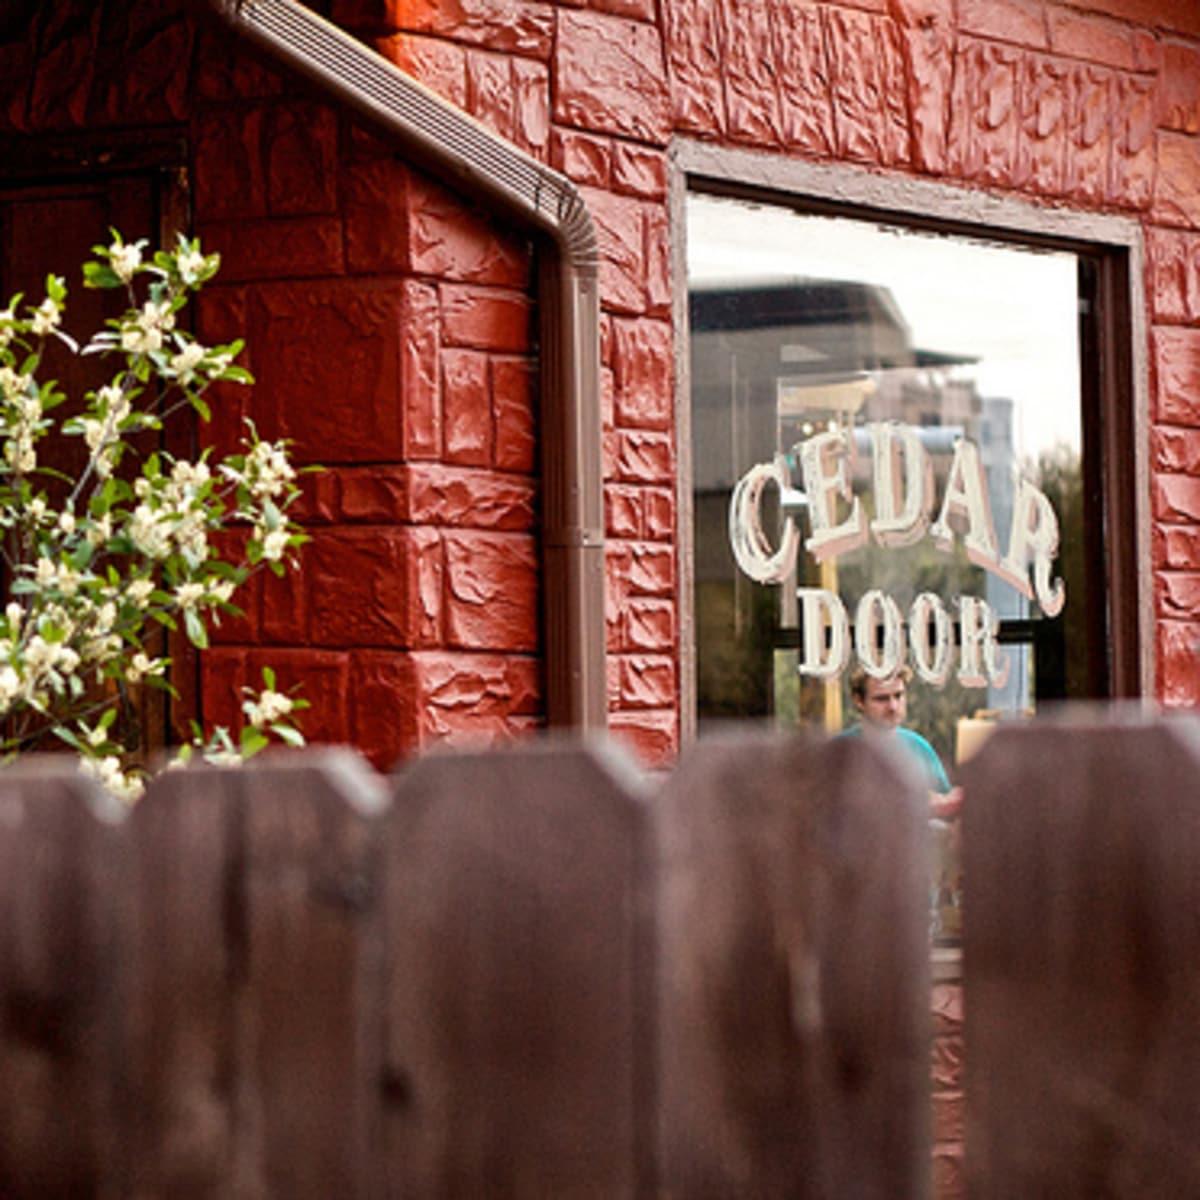 Austin_photo: places_food_cedar_door_exterior